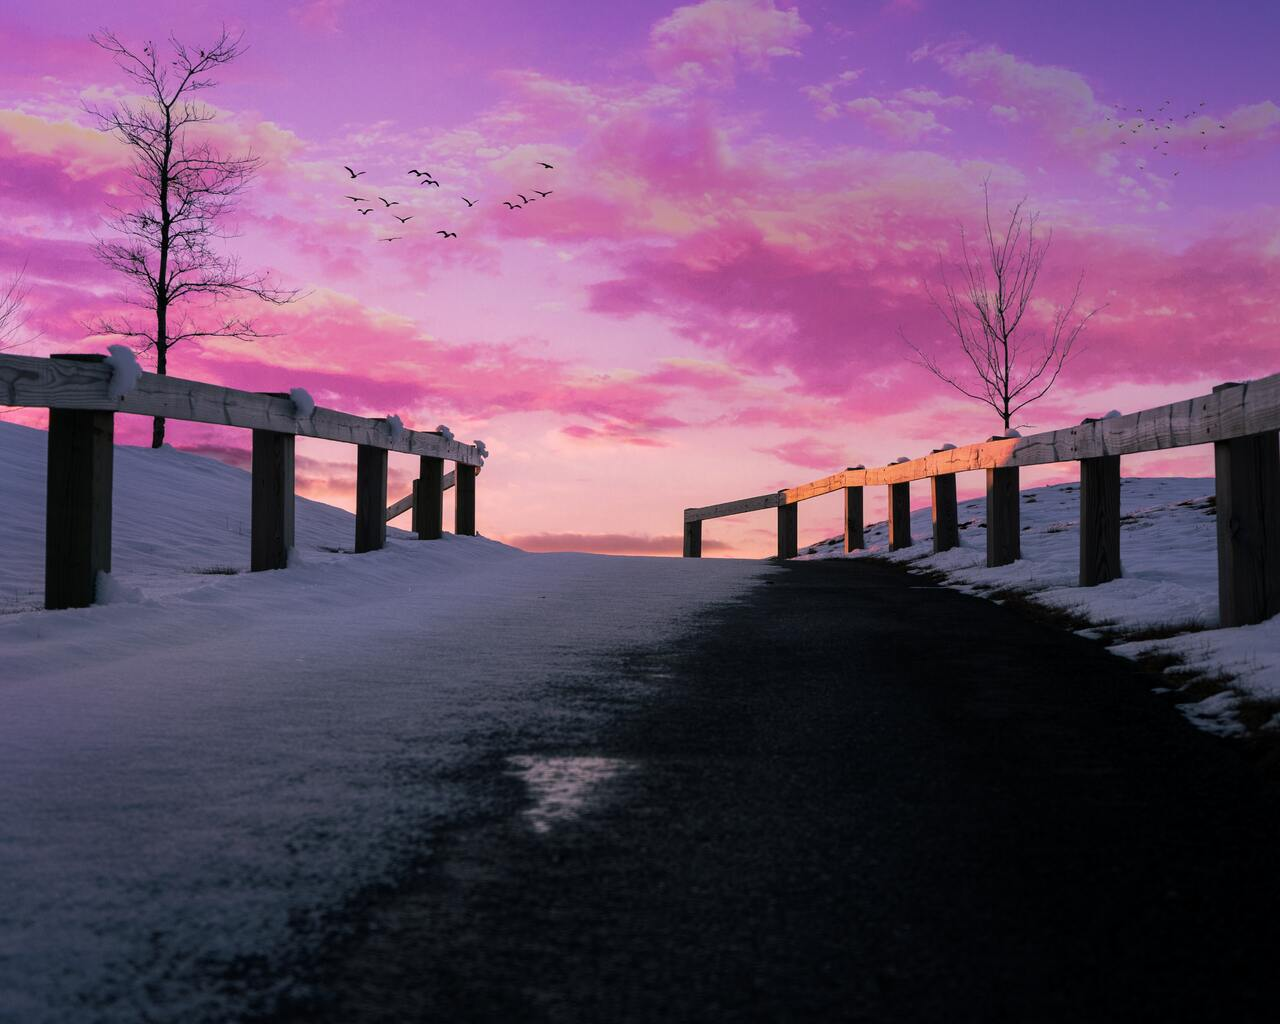 1280x1024 Aesthetics Pink Pink Sky 5k 1280x1024 Resolution Hd 4k